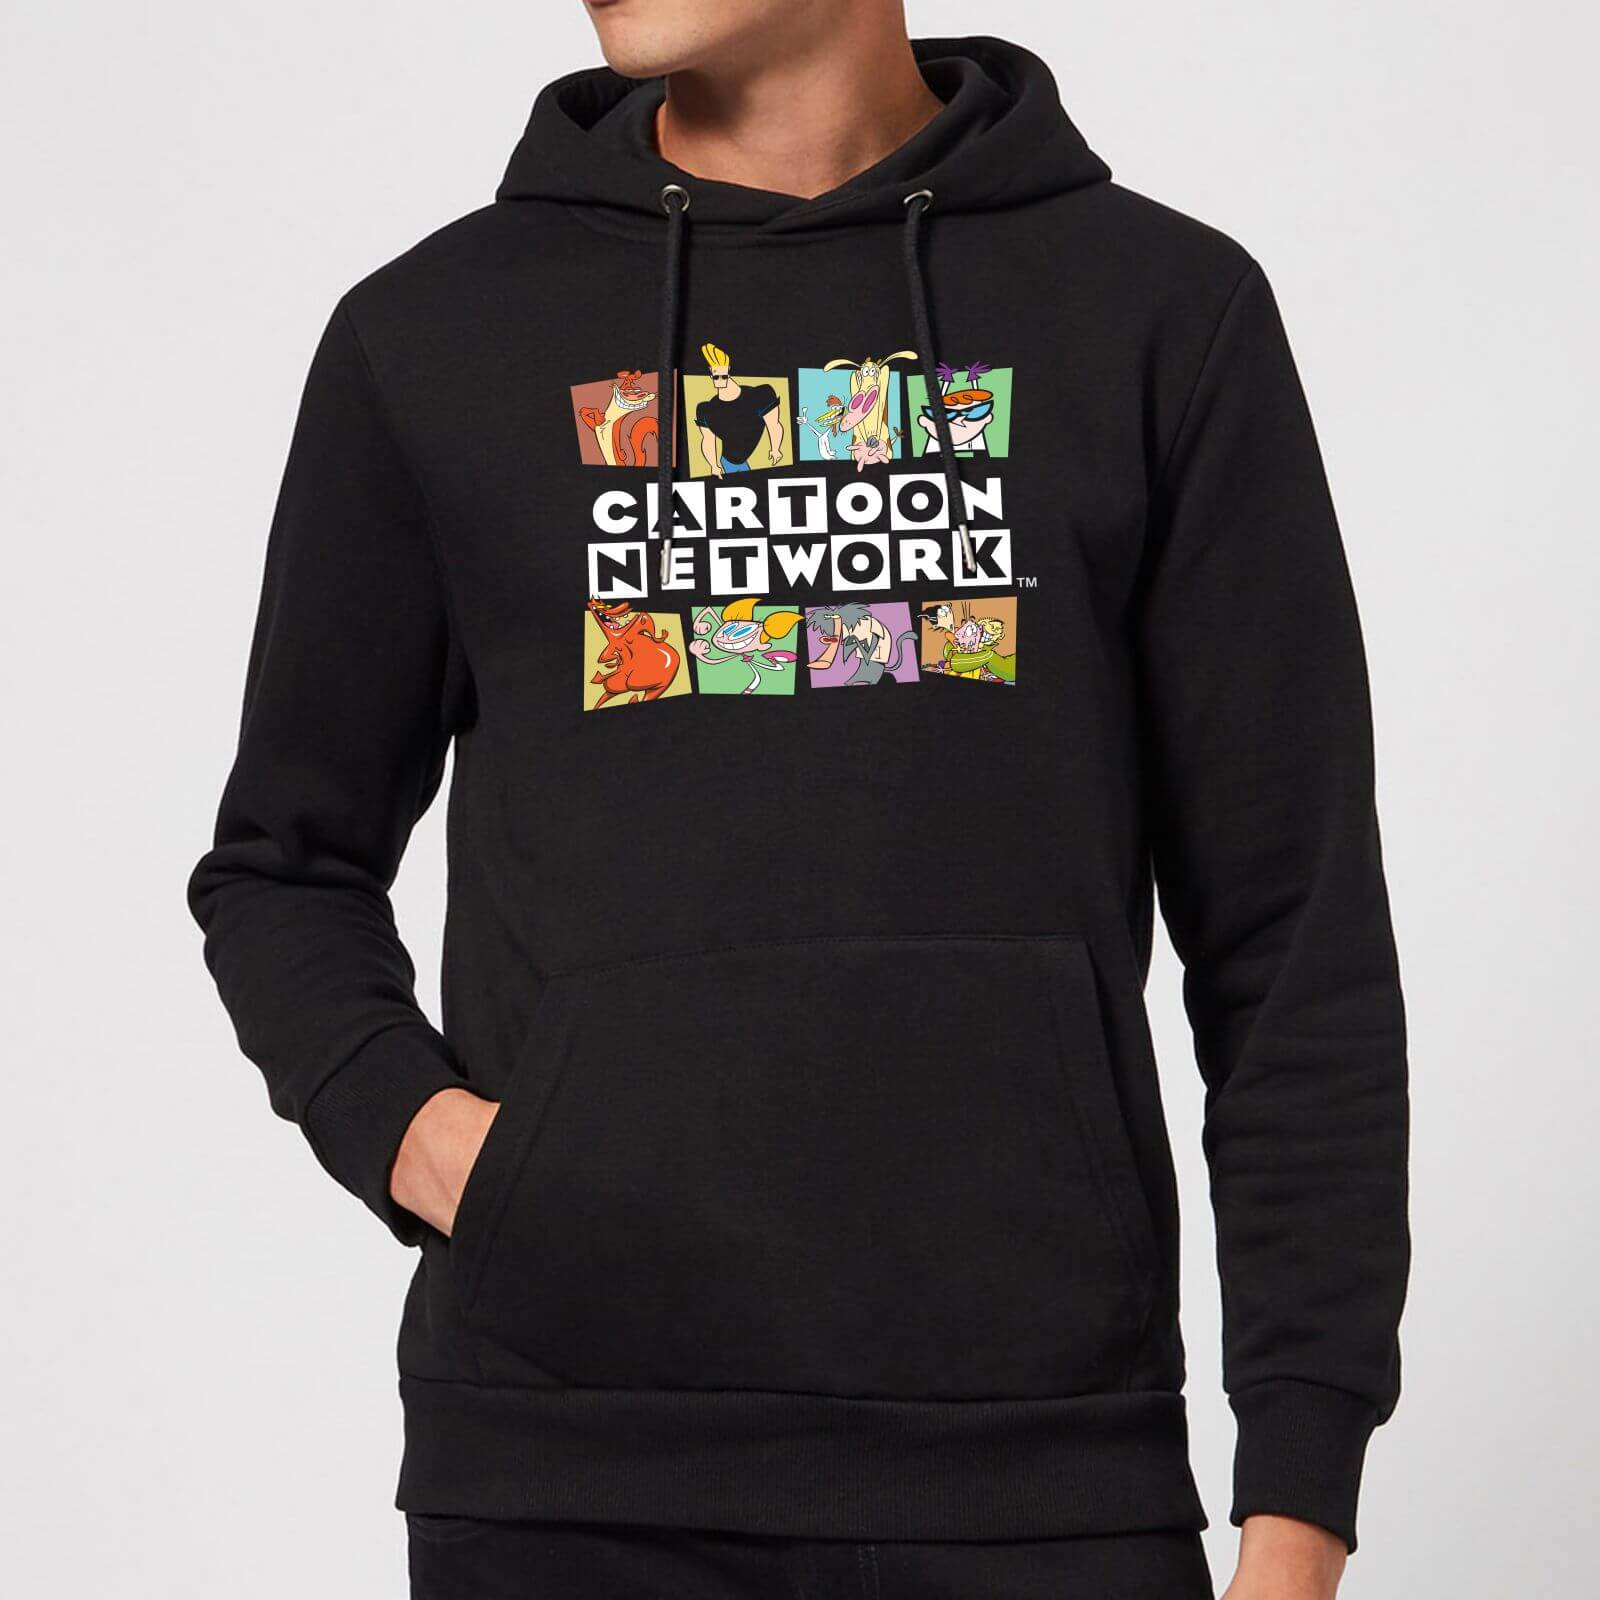 All Character Cartoon Network Hoodie Cartoon Clothing